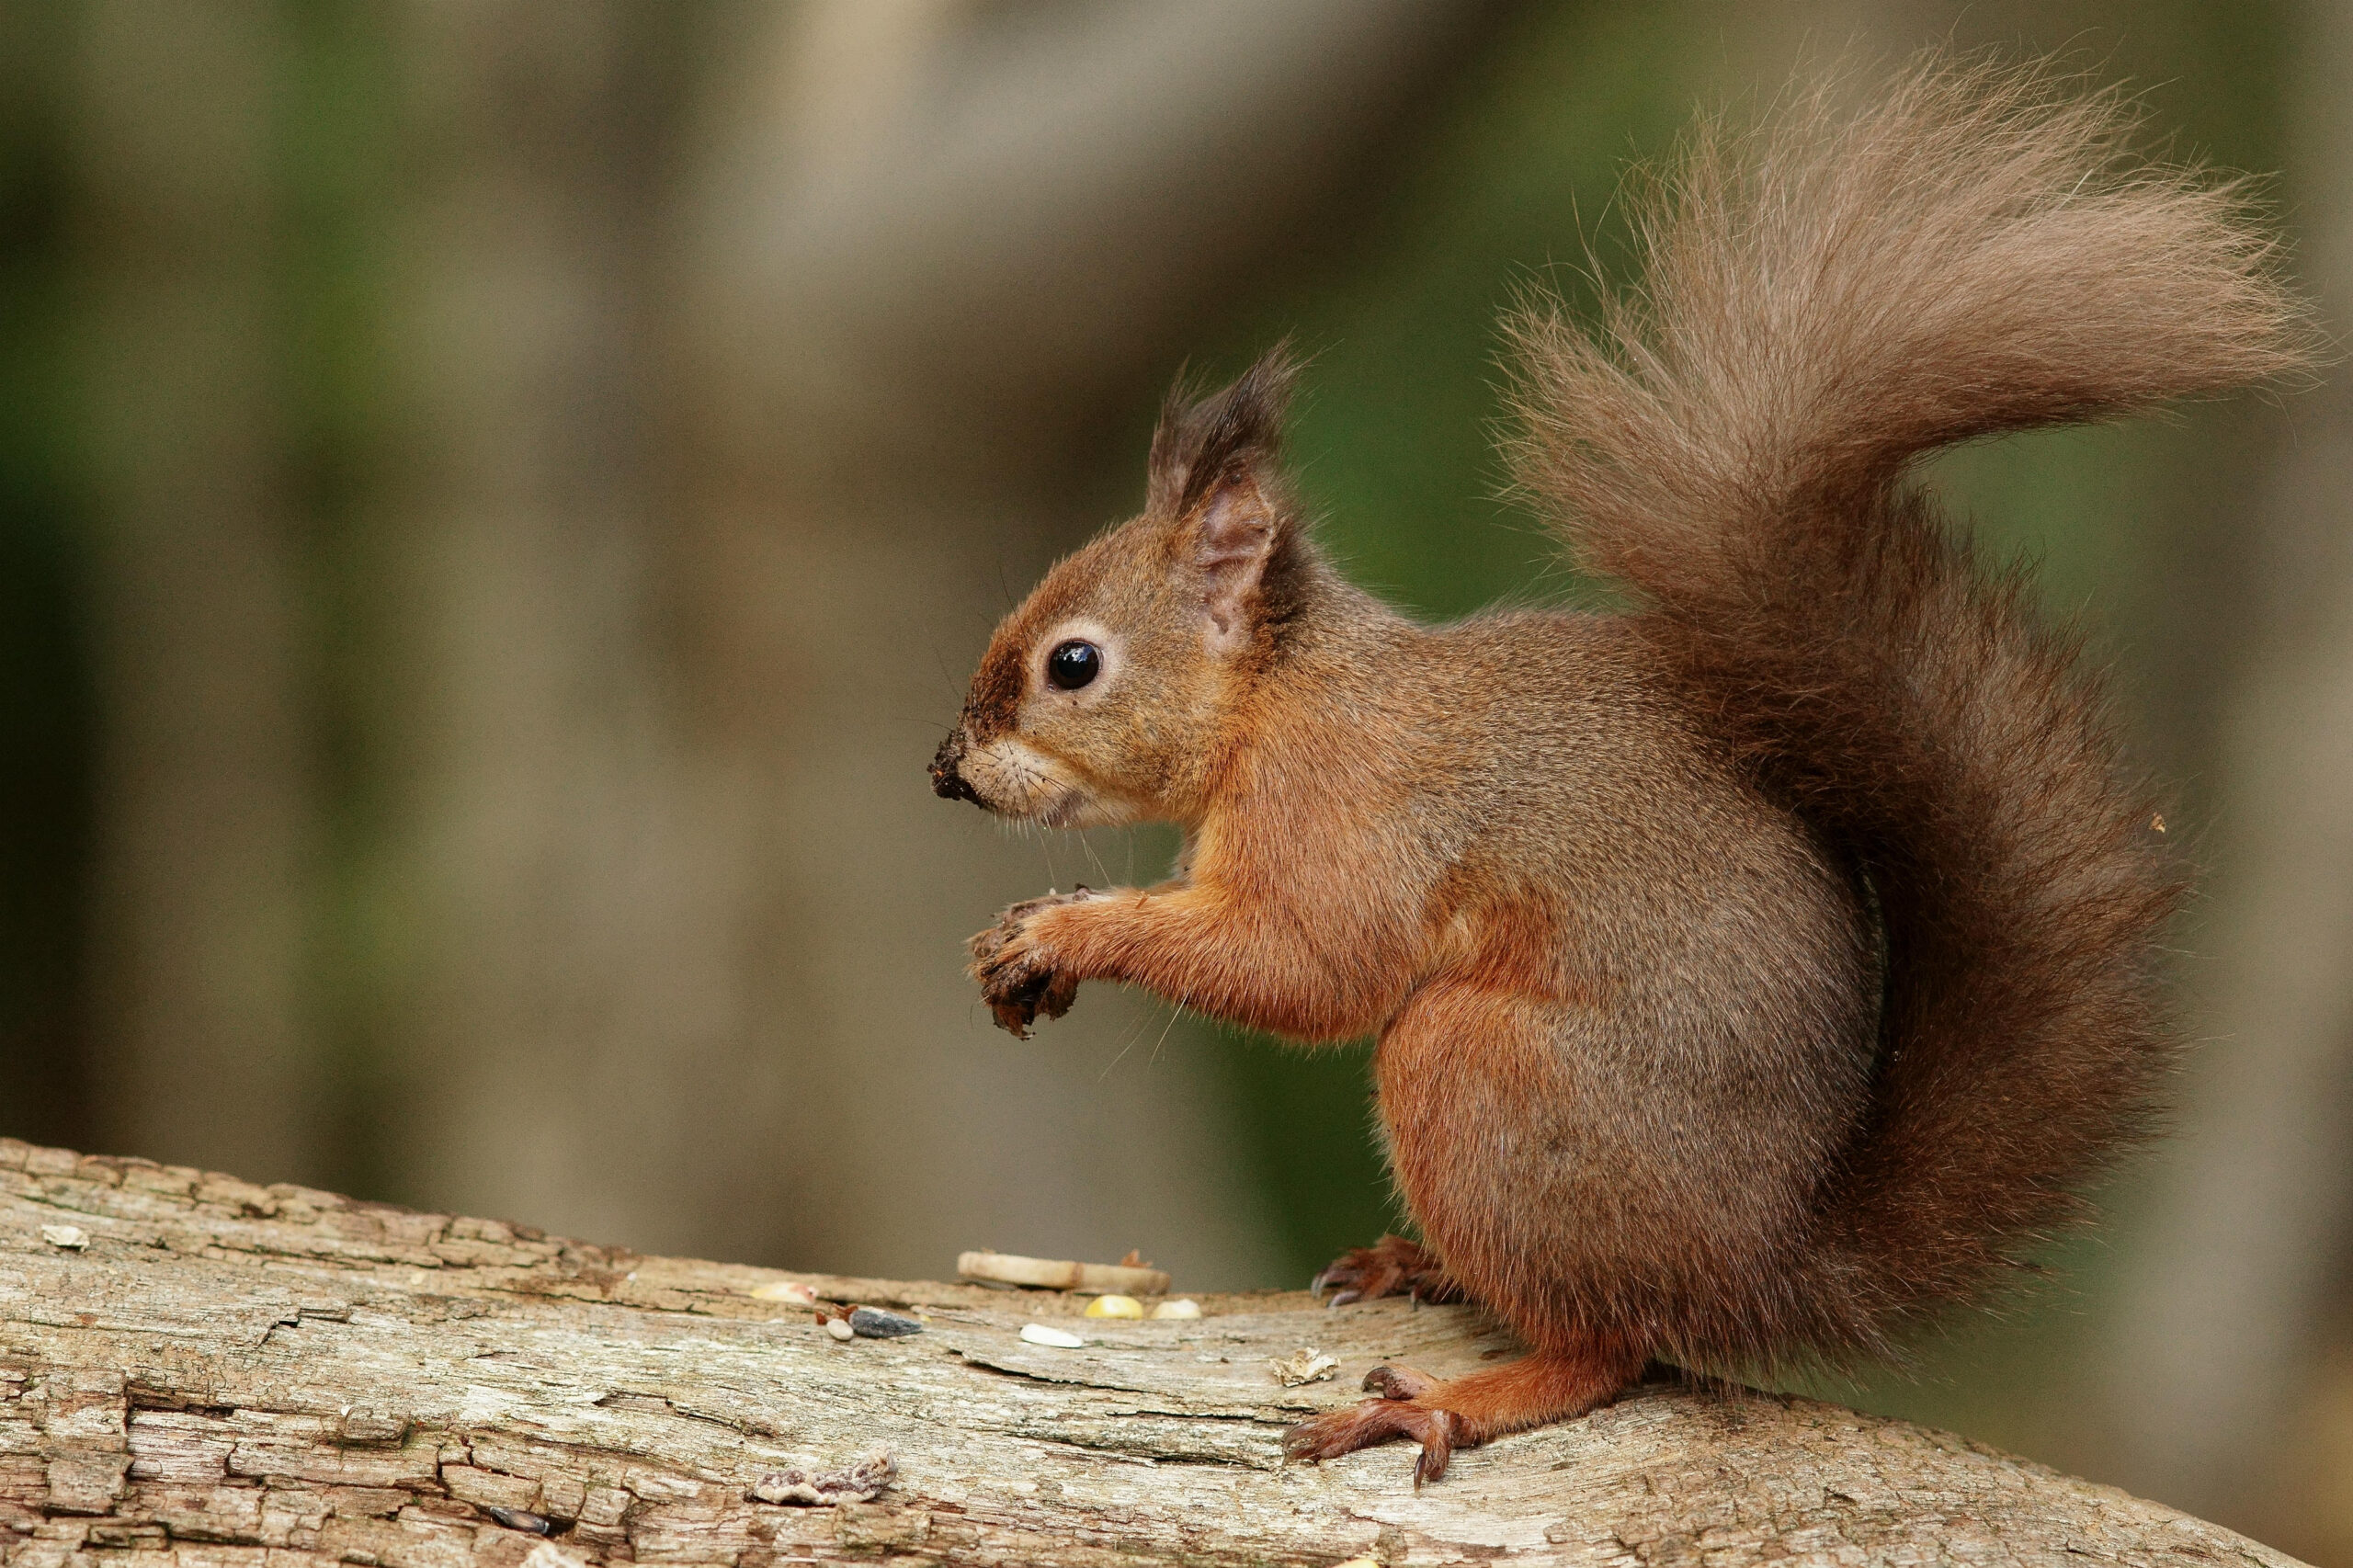 Brownsea Island Squirrel 1 | Brownsea Island